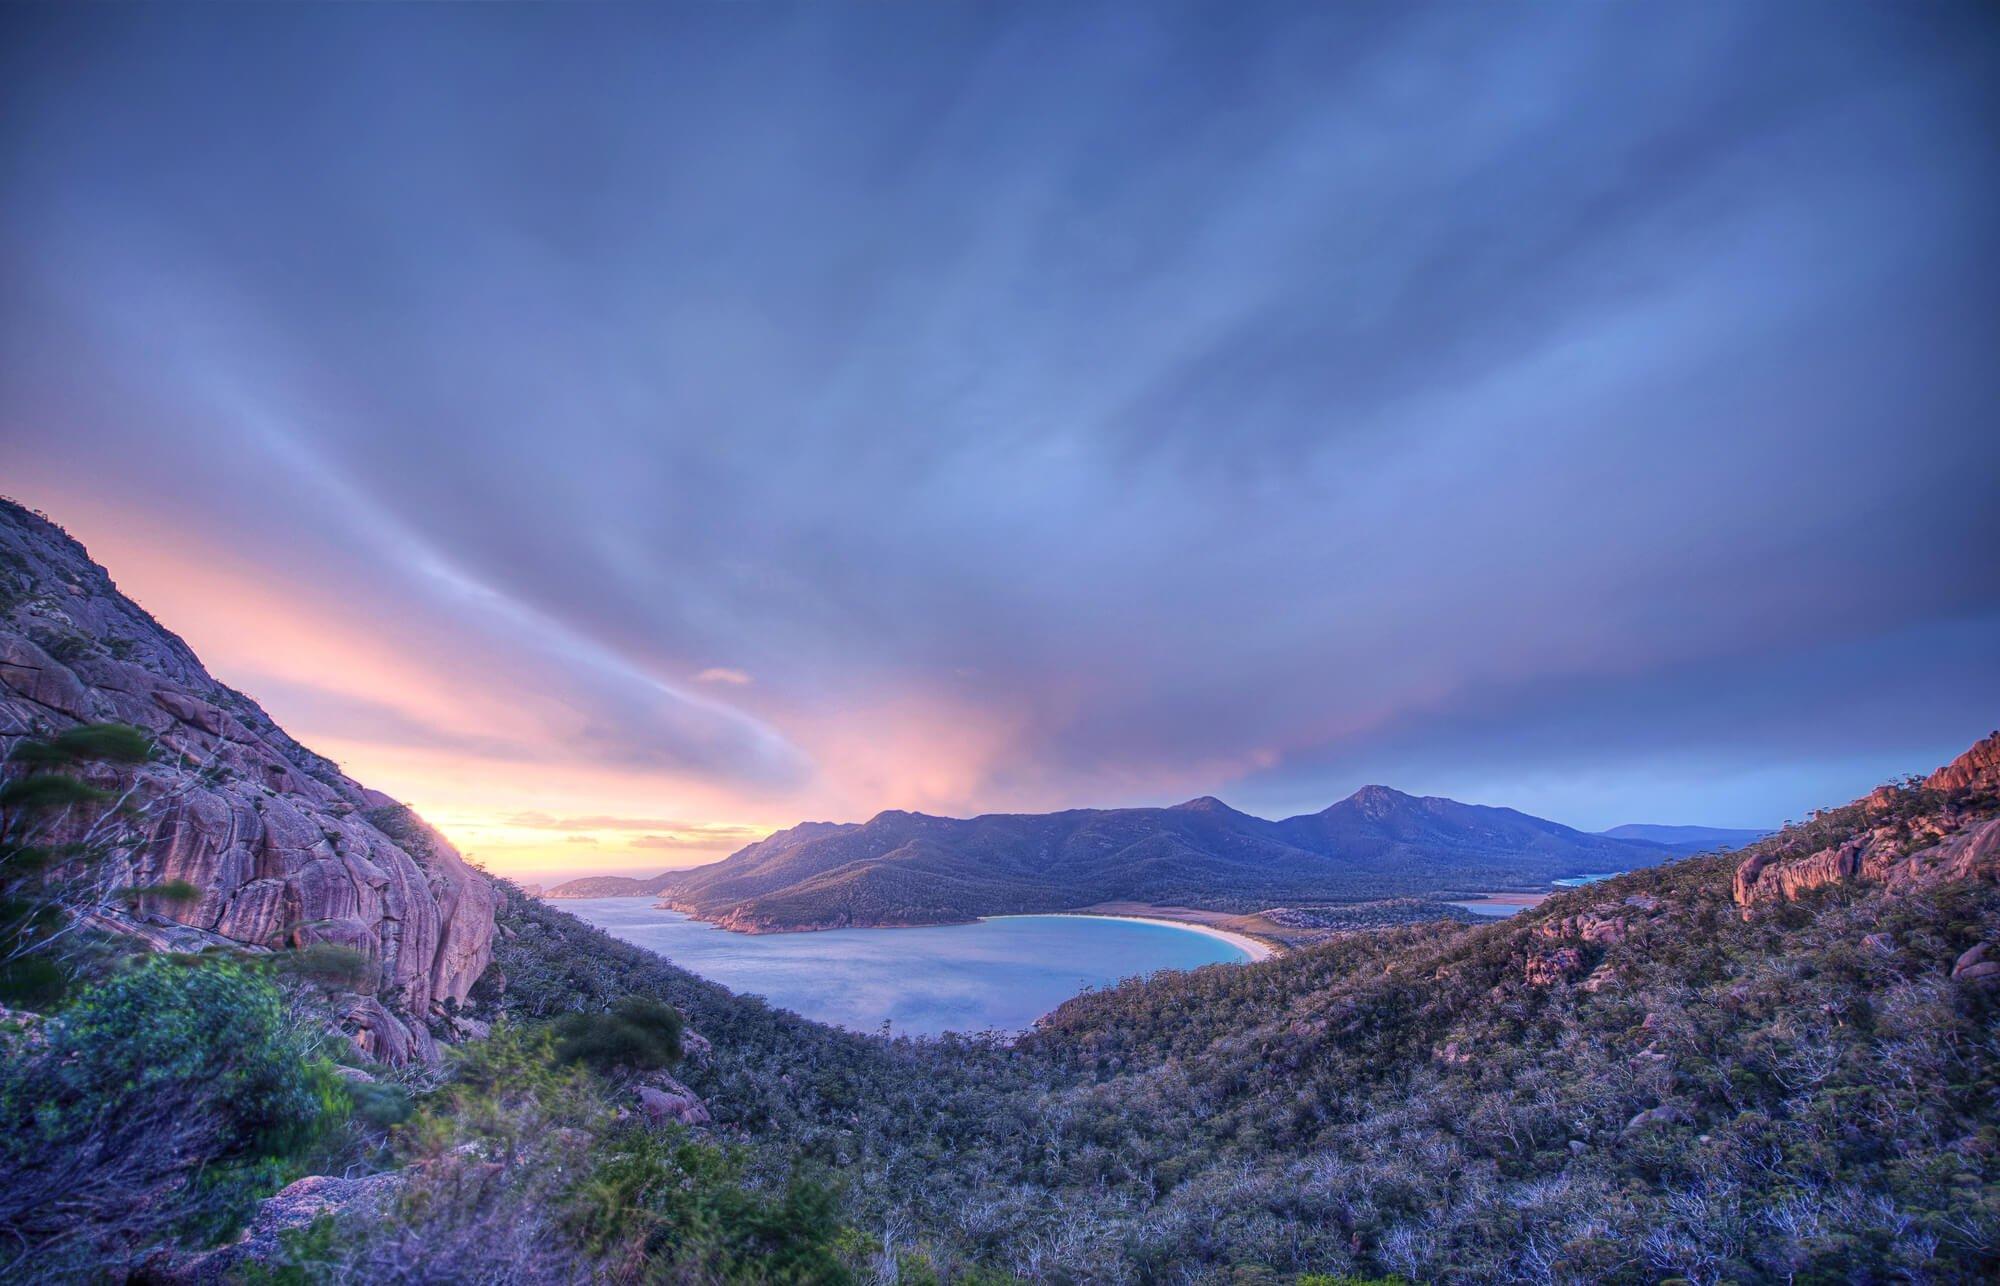 Wineglass Bay, Freycinet Peninsula - one of Australia's most beautiful national parks